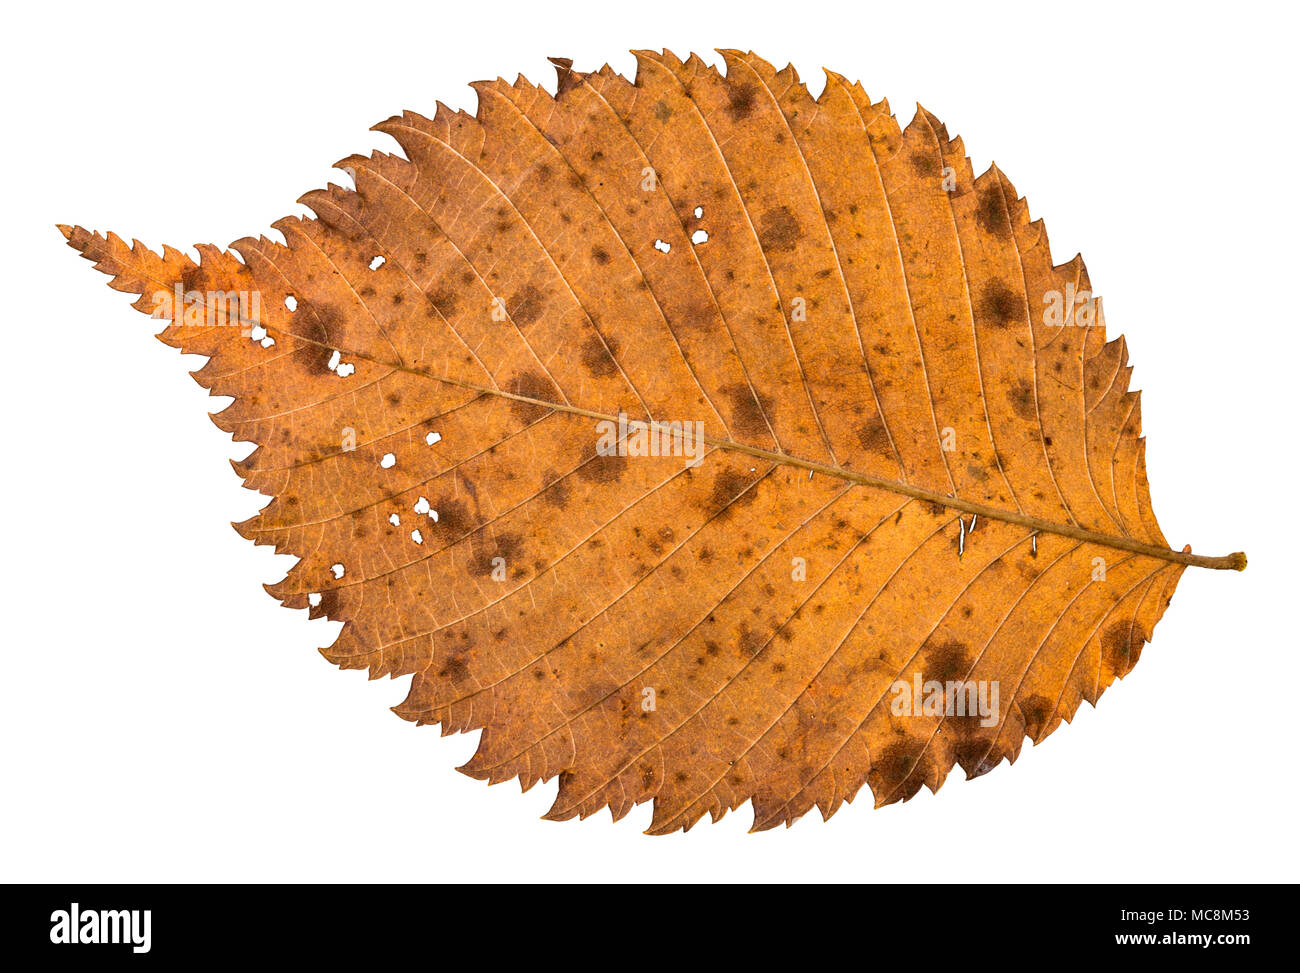 back side of autumn decayed holey leaf of elm tree isolated on white background - Stock Image